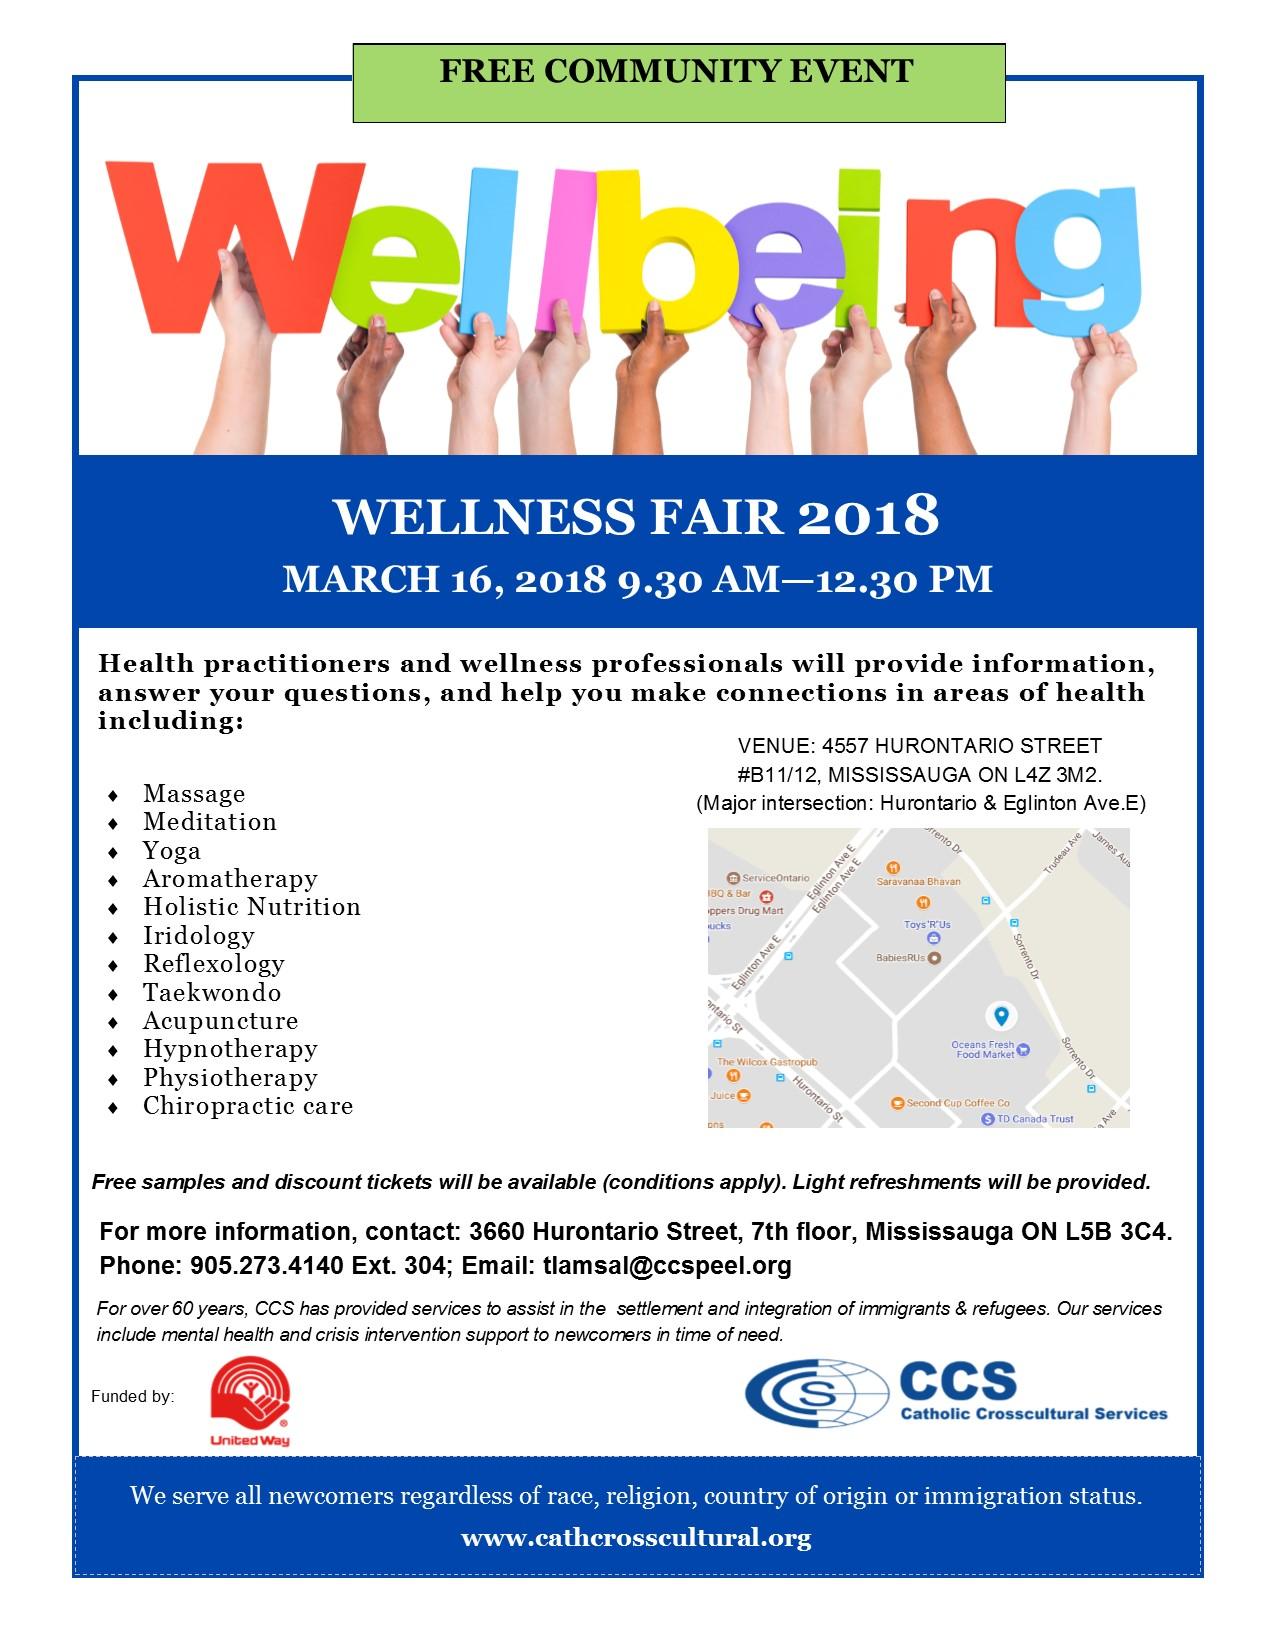 Wellness Fair 2018